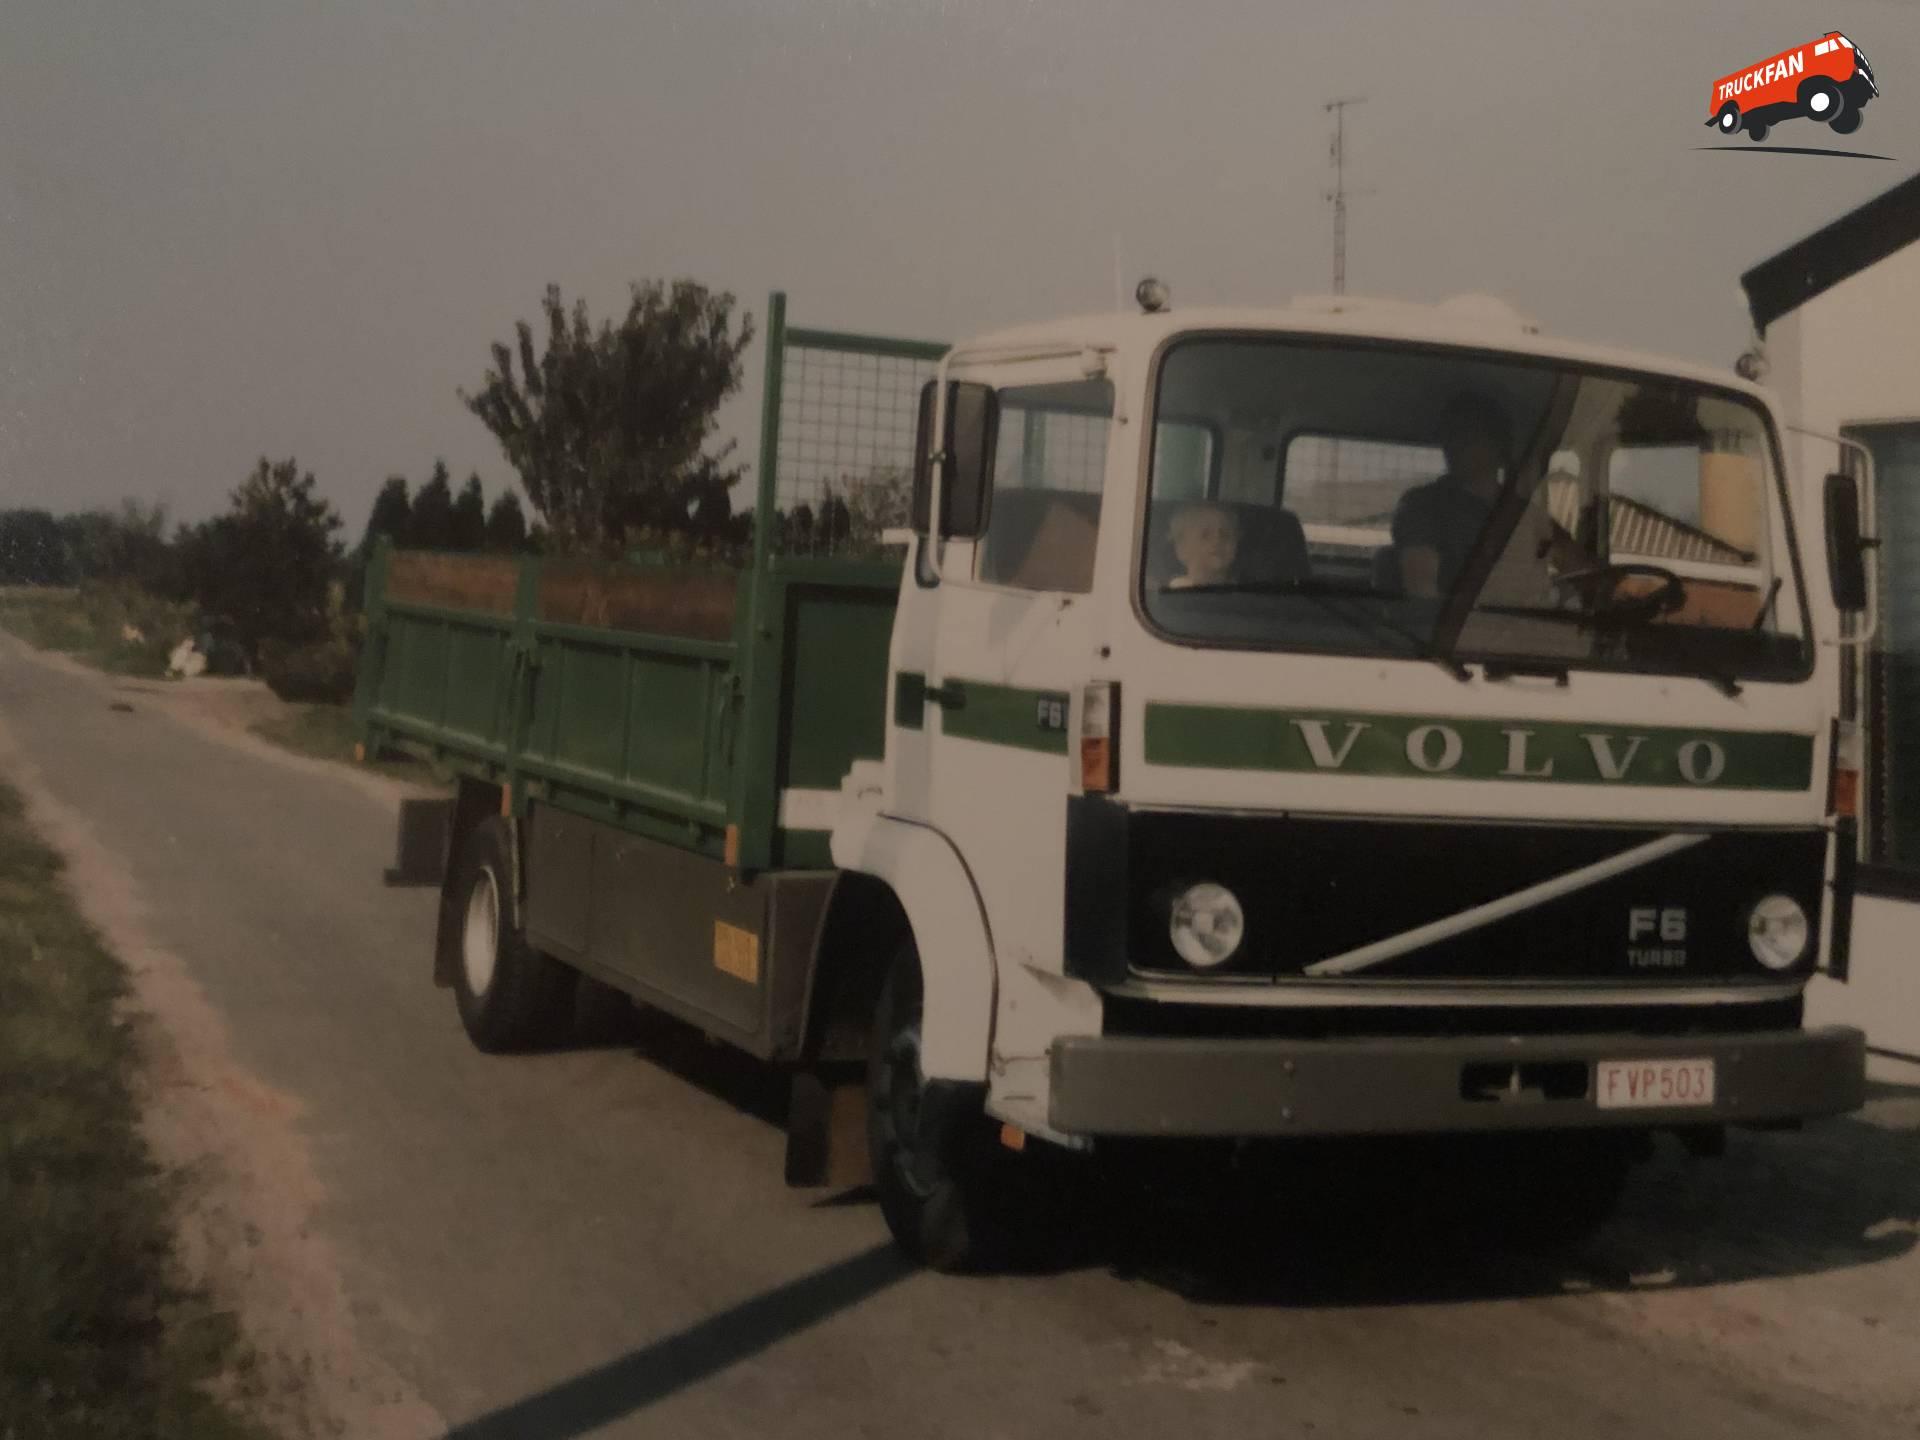 Volvo F6